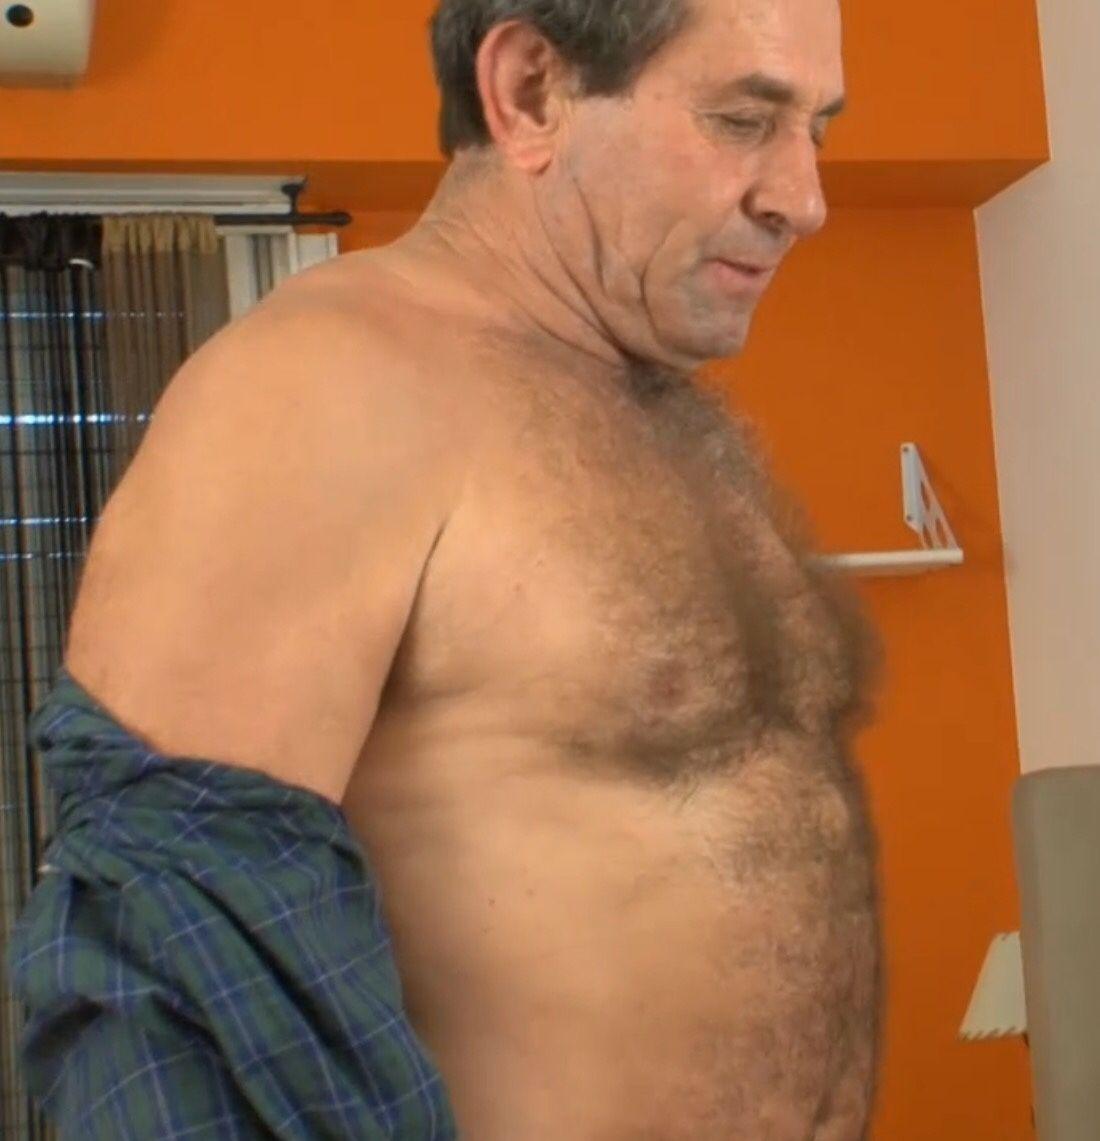 Porno De Hombre 52